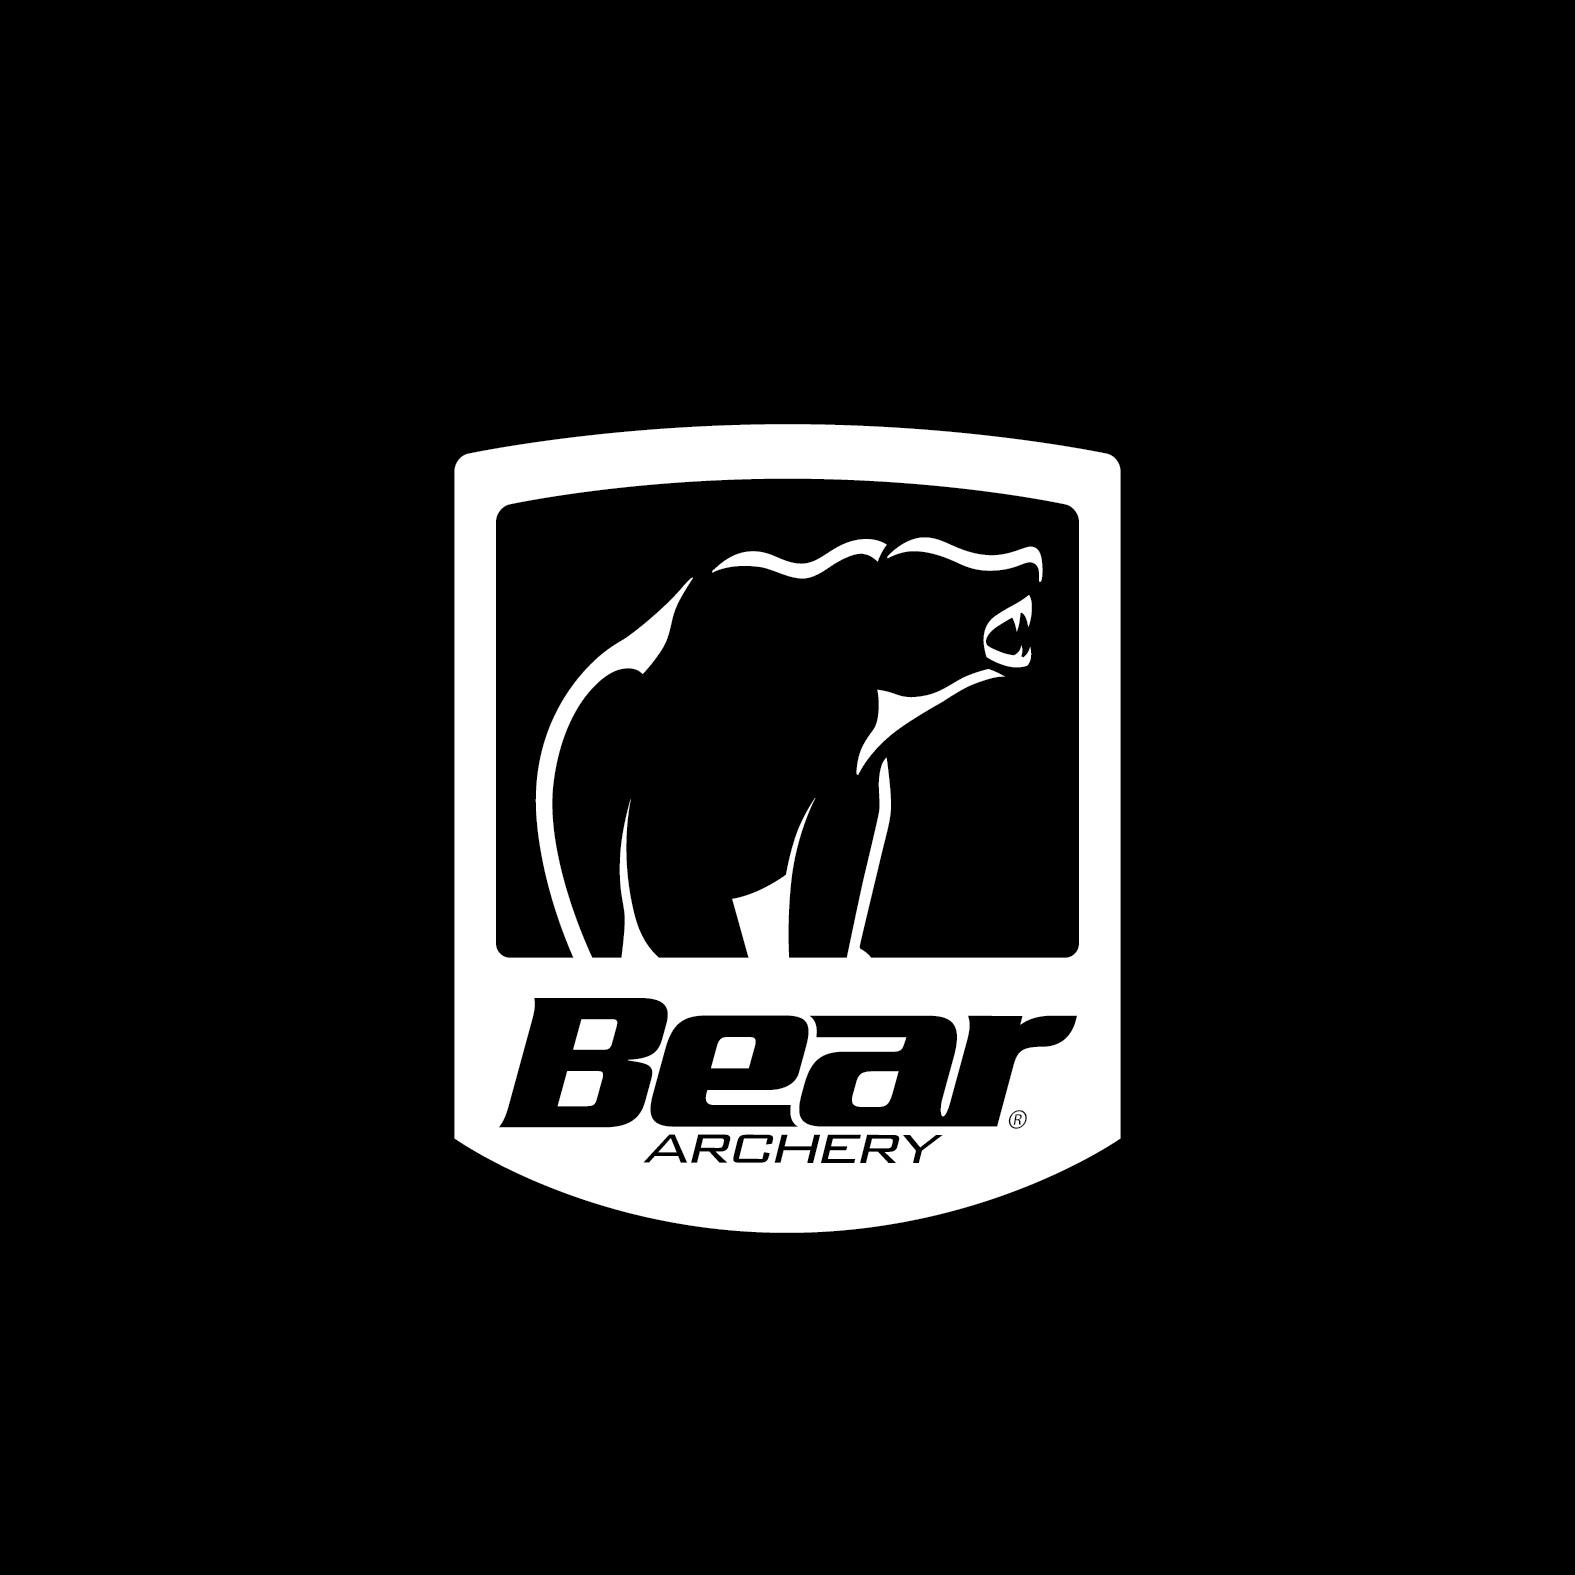 Bear Archery Logos